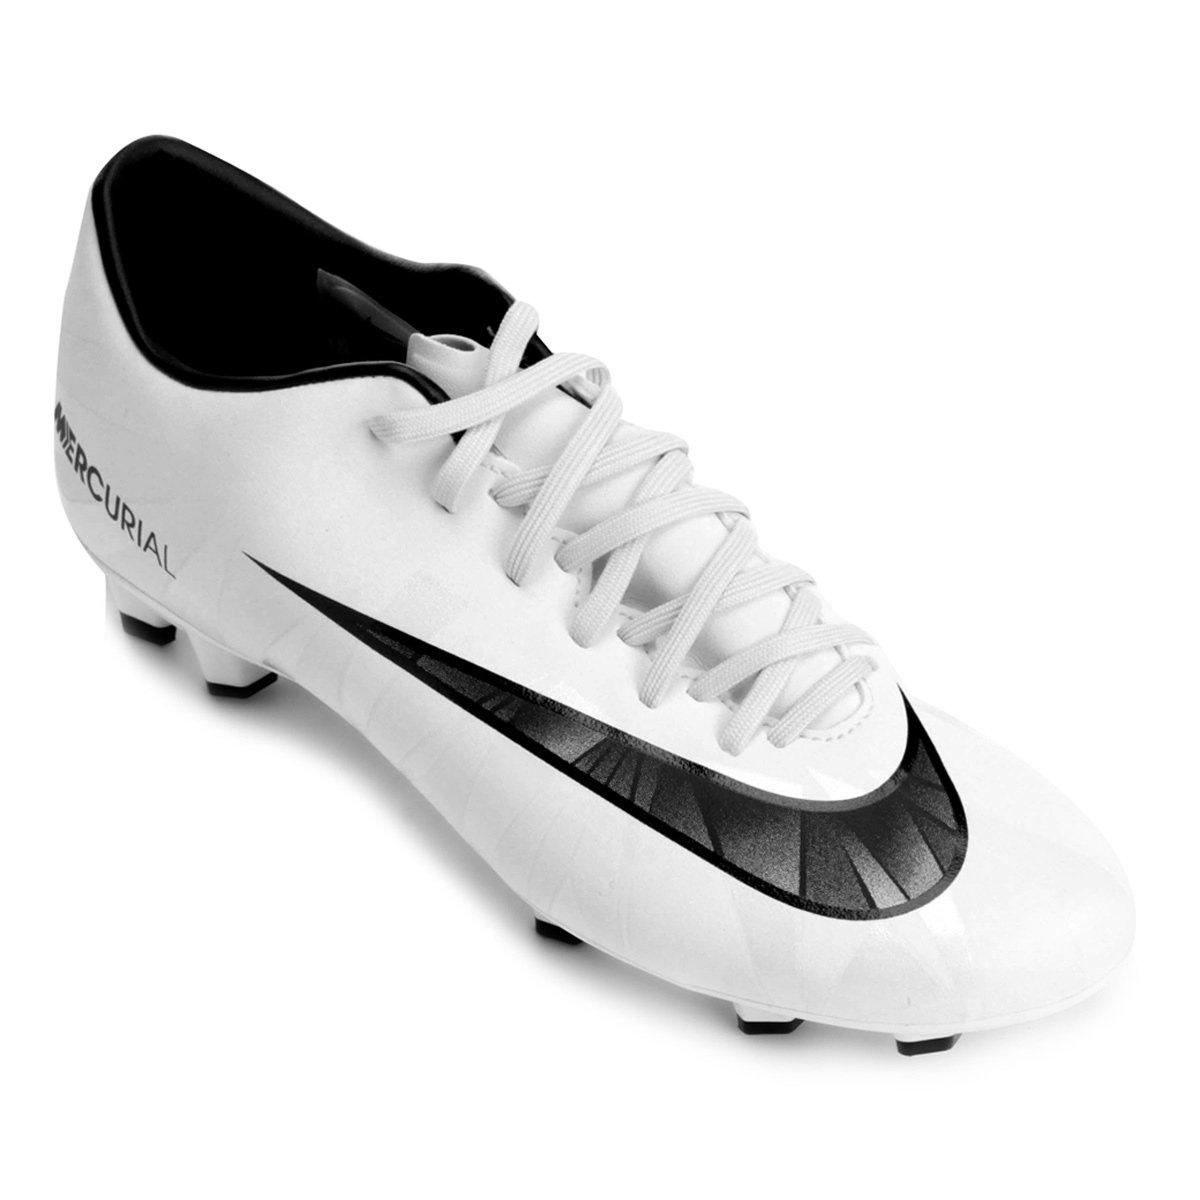 Chuteira Campo Nike Mercurial Victory 6 CR7 Masculina  609aef22976a7